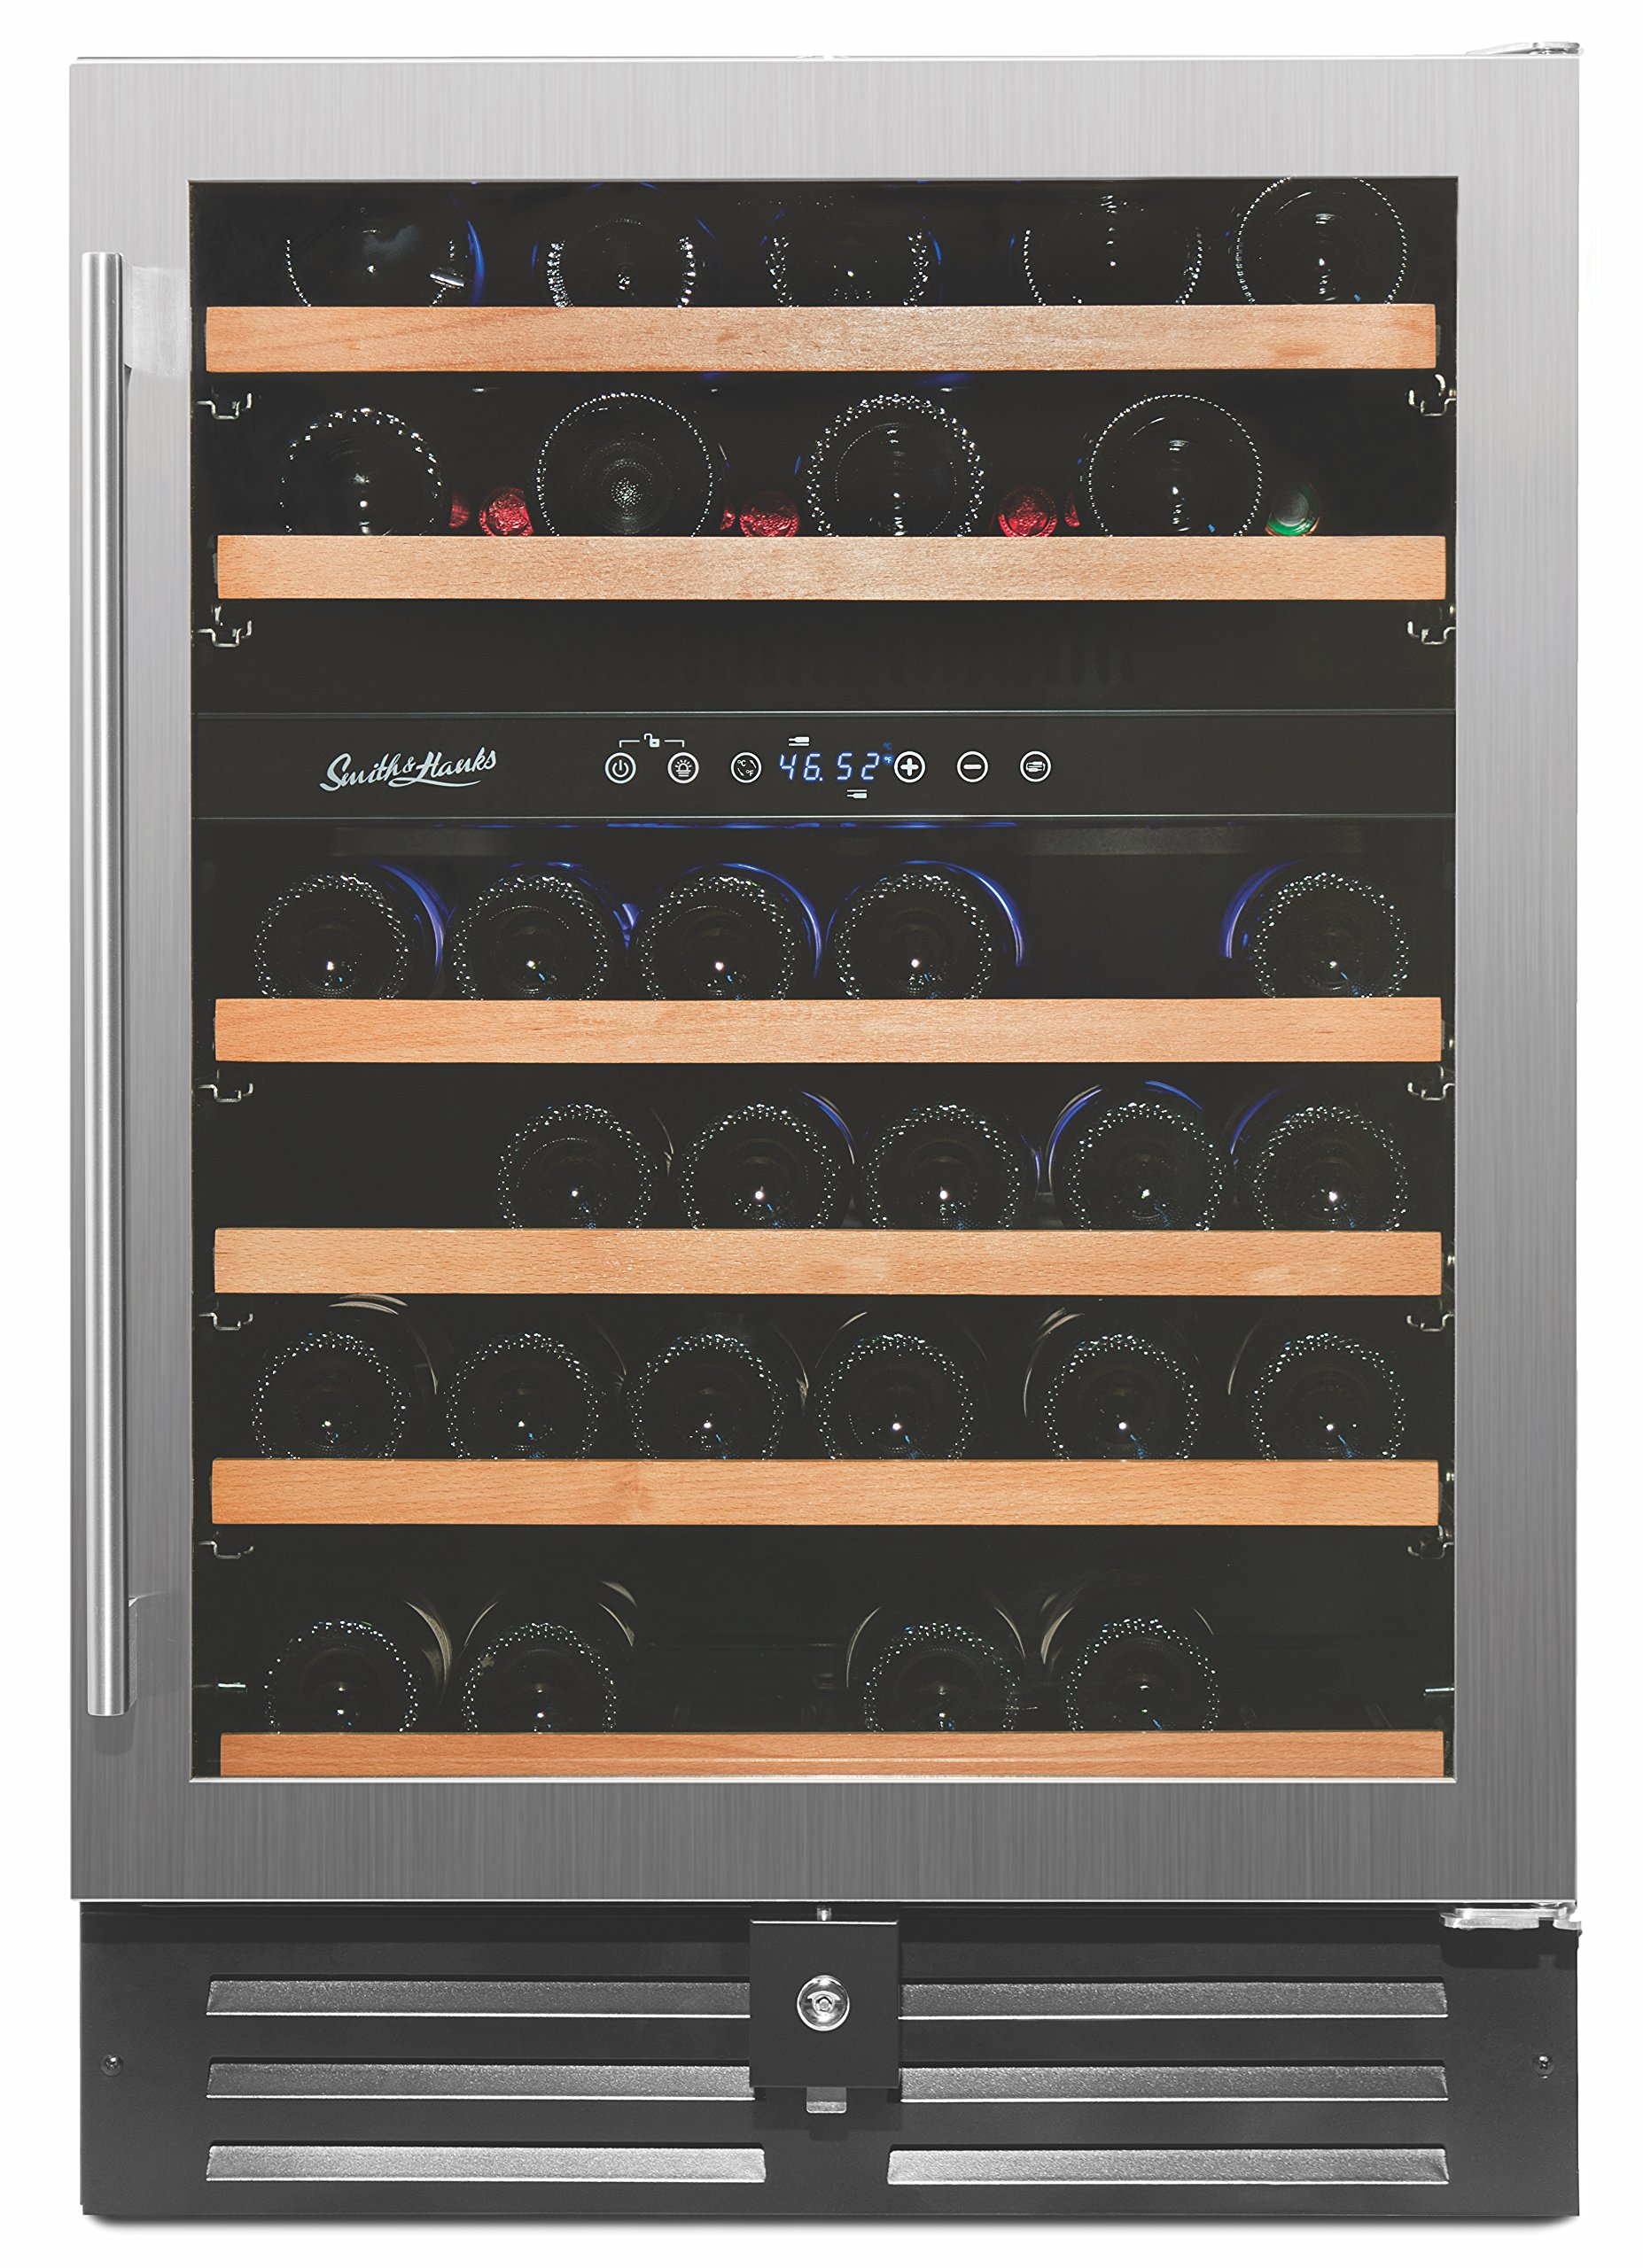 Smith & Hanks 46 Bottle Dual Zone Wine Refrigerator, Stainless Steel Door, Built-In or Free Standing Professional Series